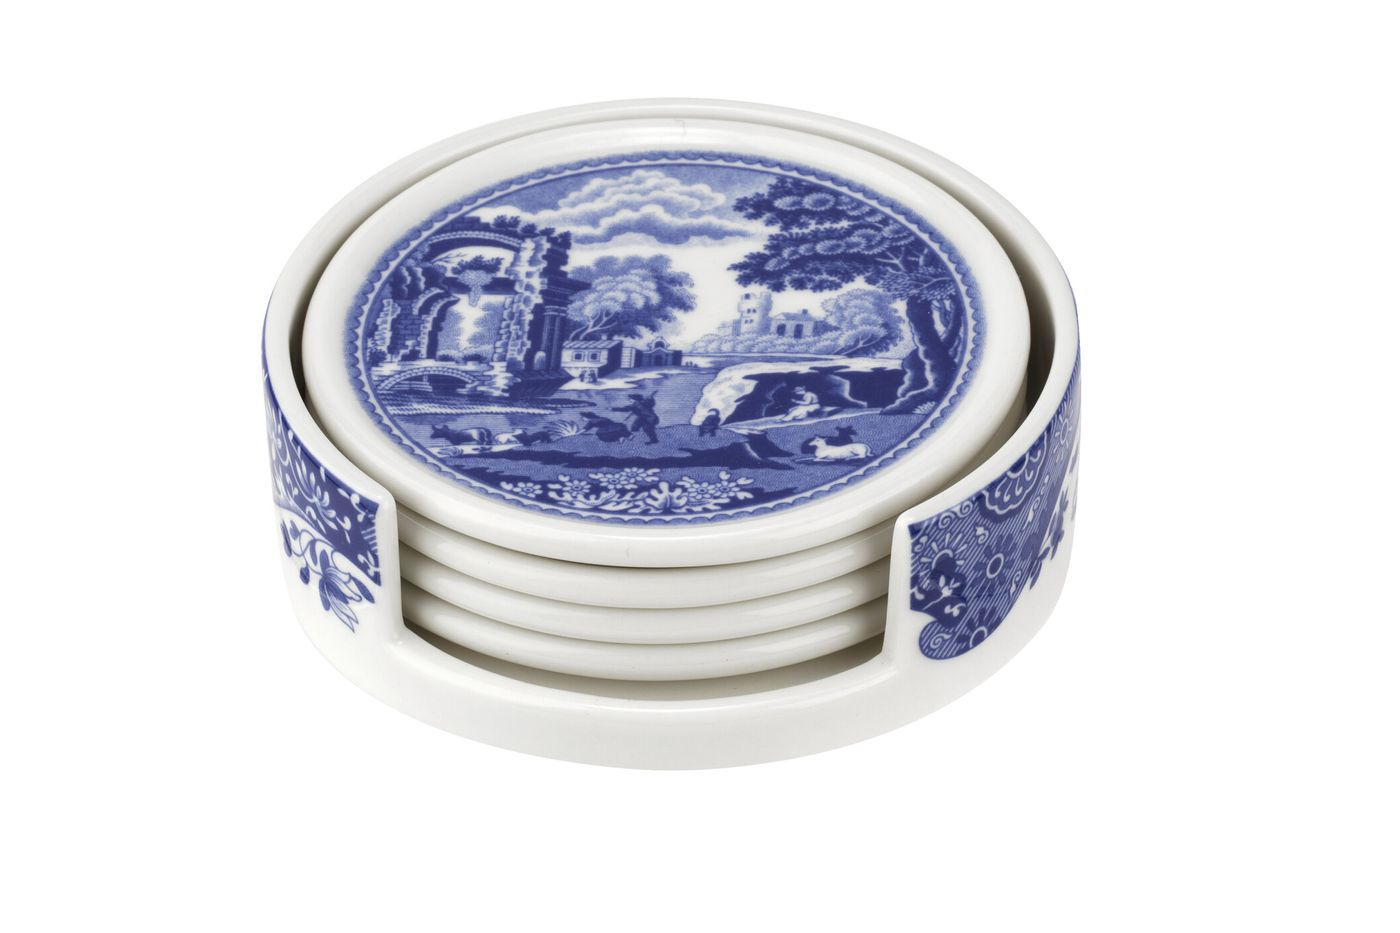 Spode Blue Italian Ceramic Coasters with Holder Set of 4 coasters thumb 2